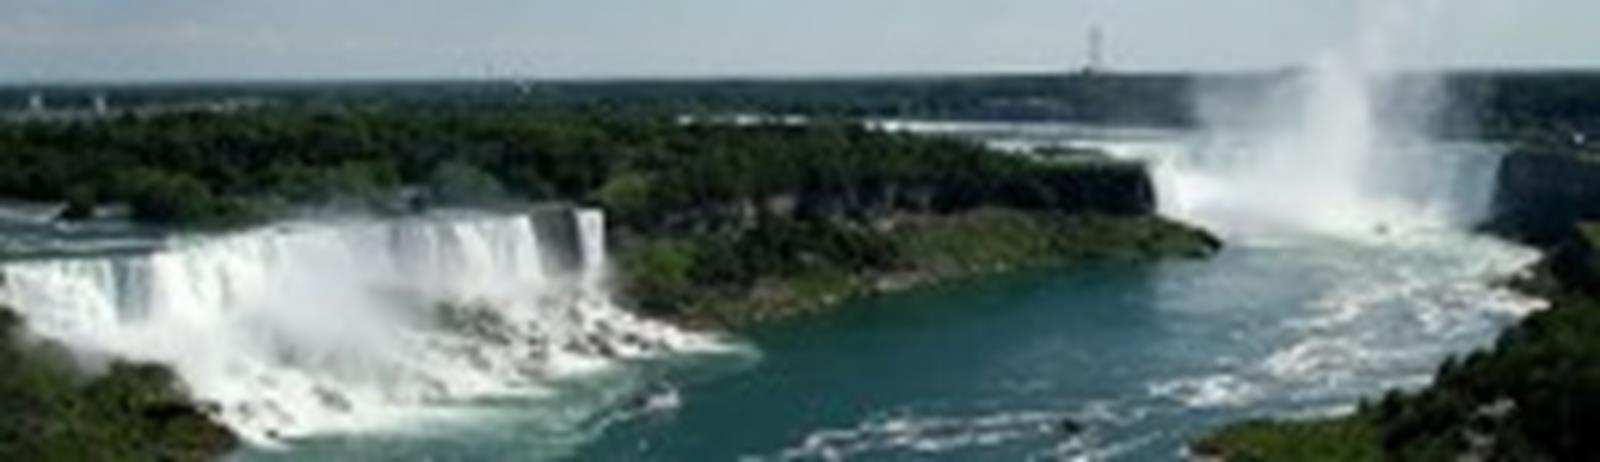 1280px-3Falls_Niagara